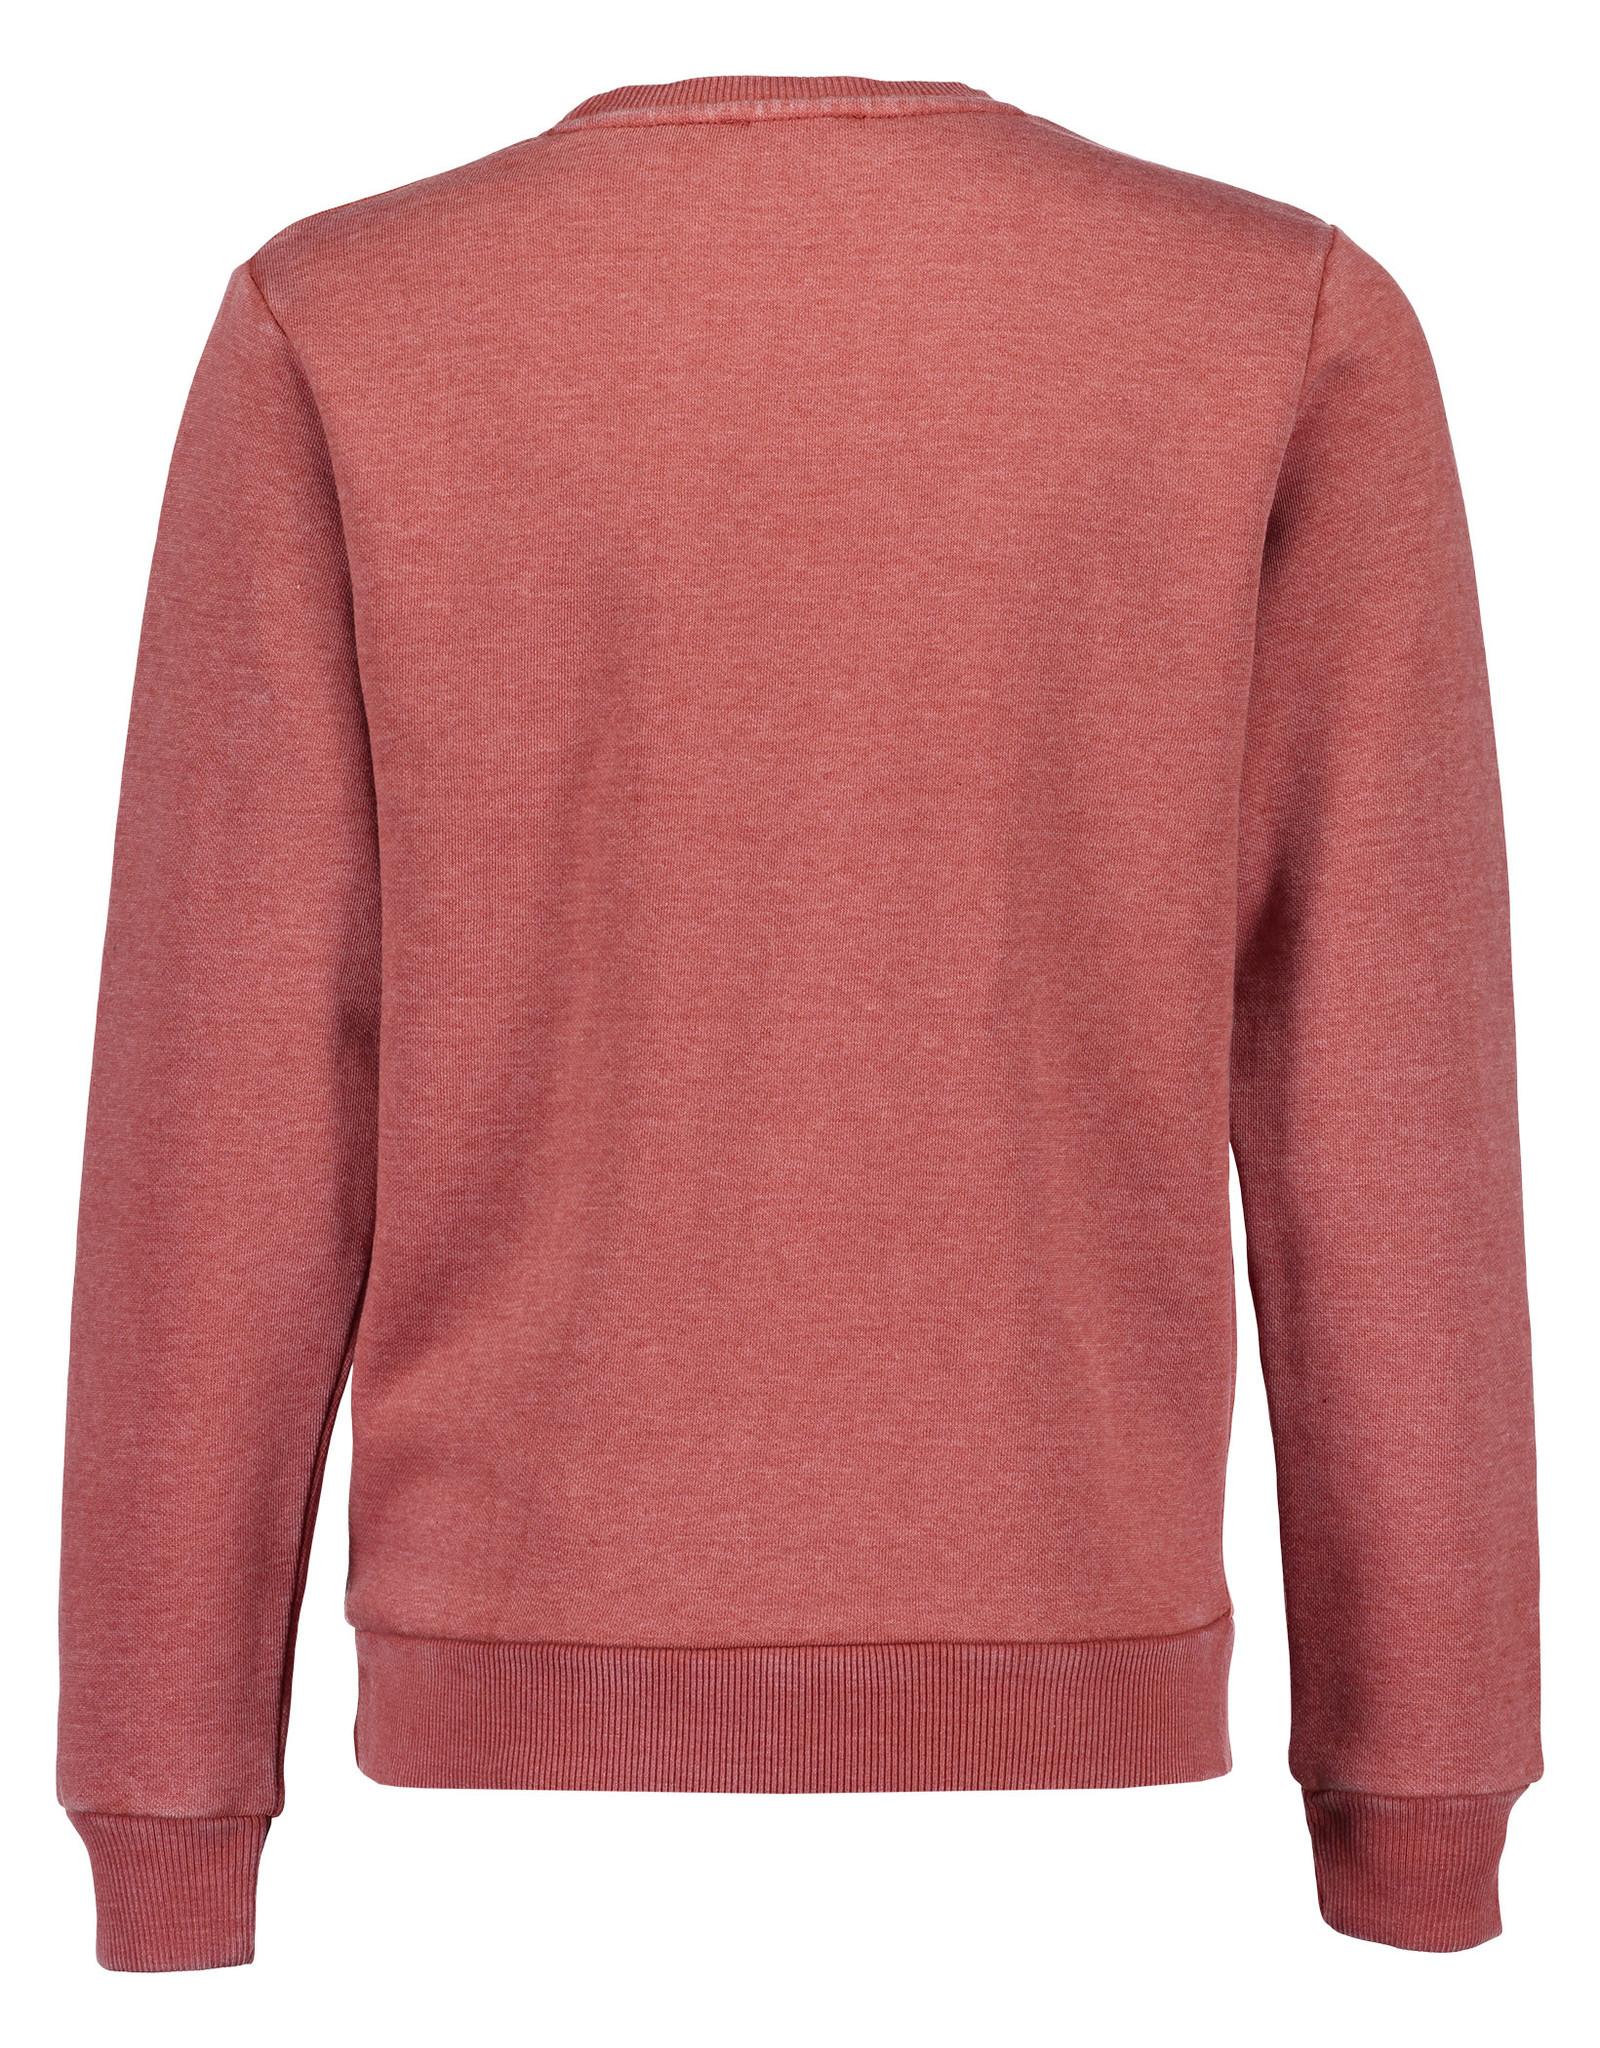 Blue Seven Blue Seven jongens sweater NO LIMITS oranje/rood